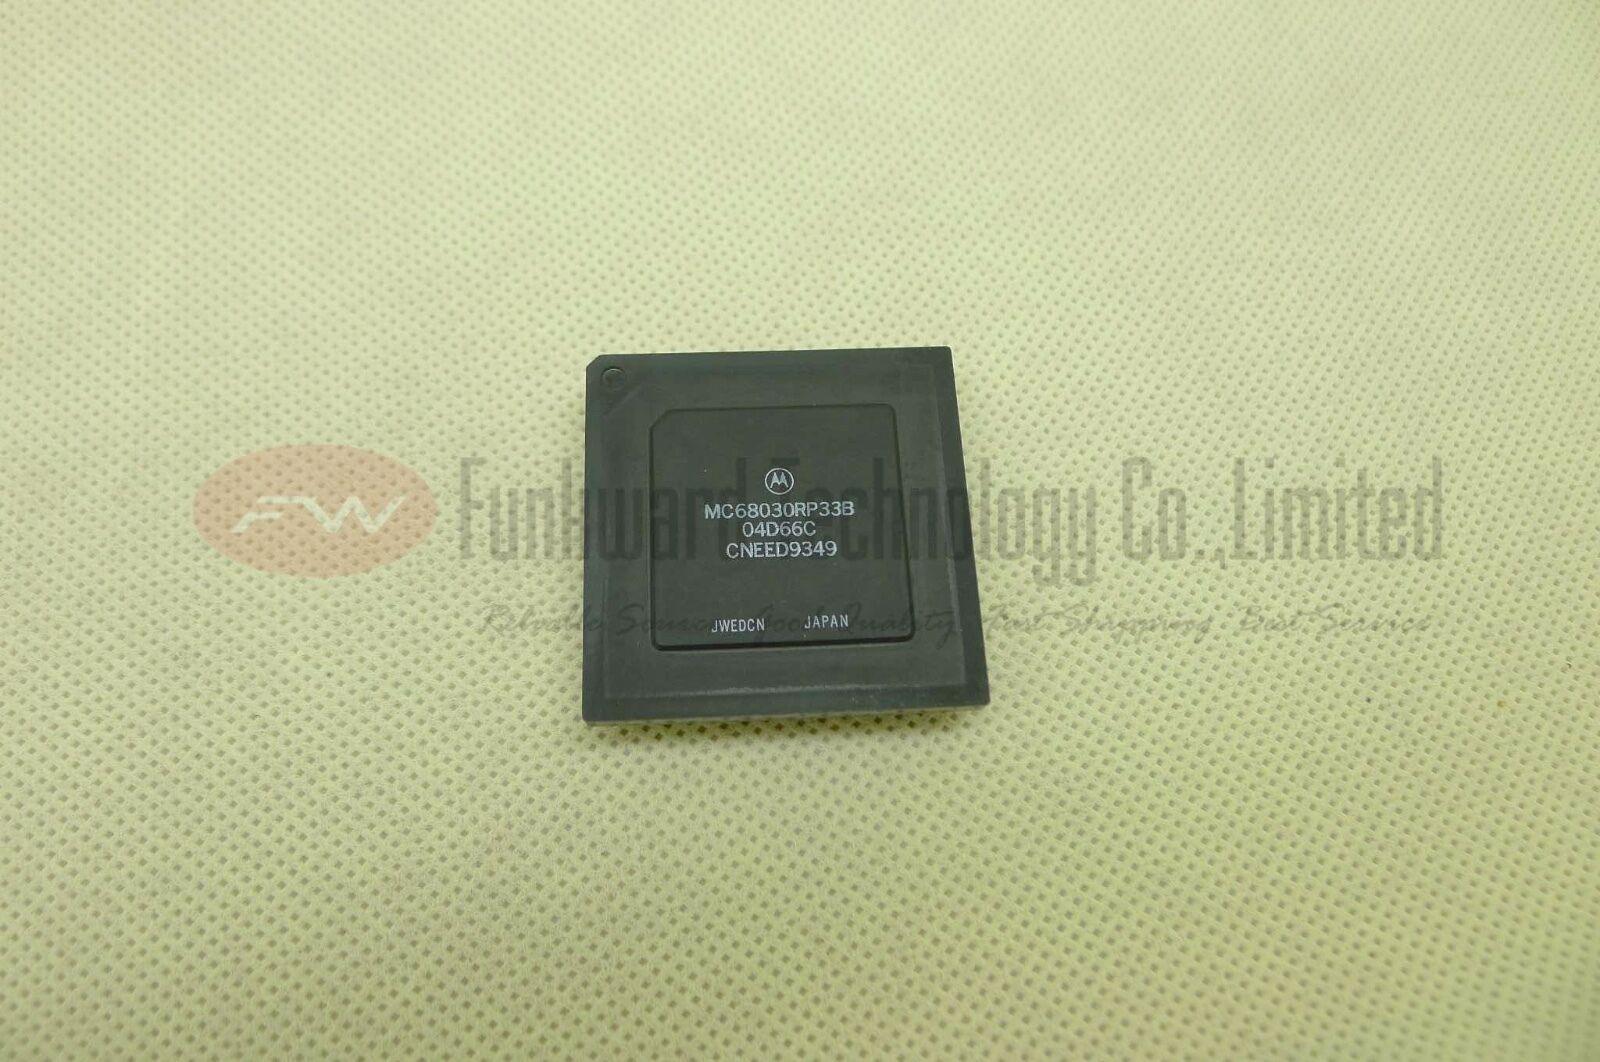 1//5PCS NEW Motorola MC68030RP33B ENHANCED 32-BIT MICROPROCESSOR MC68030RP33